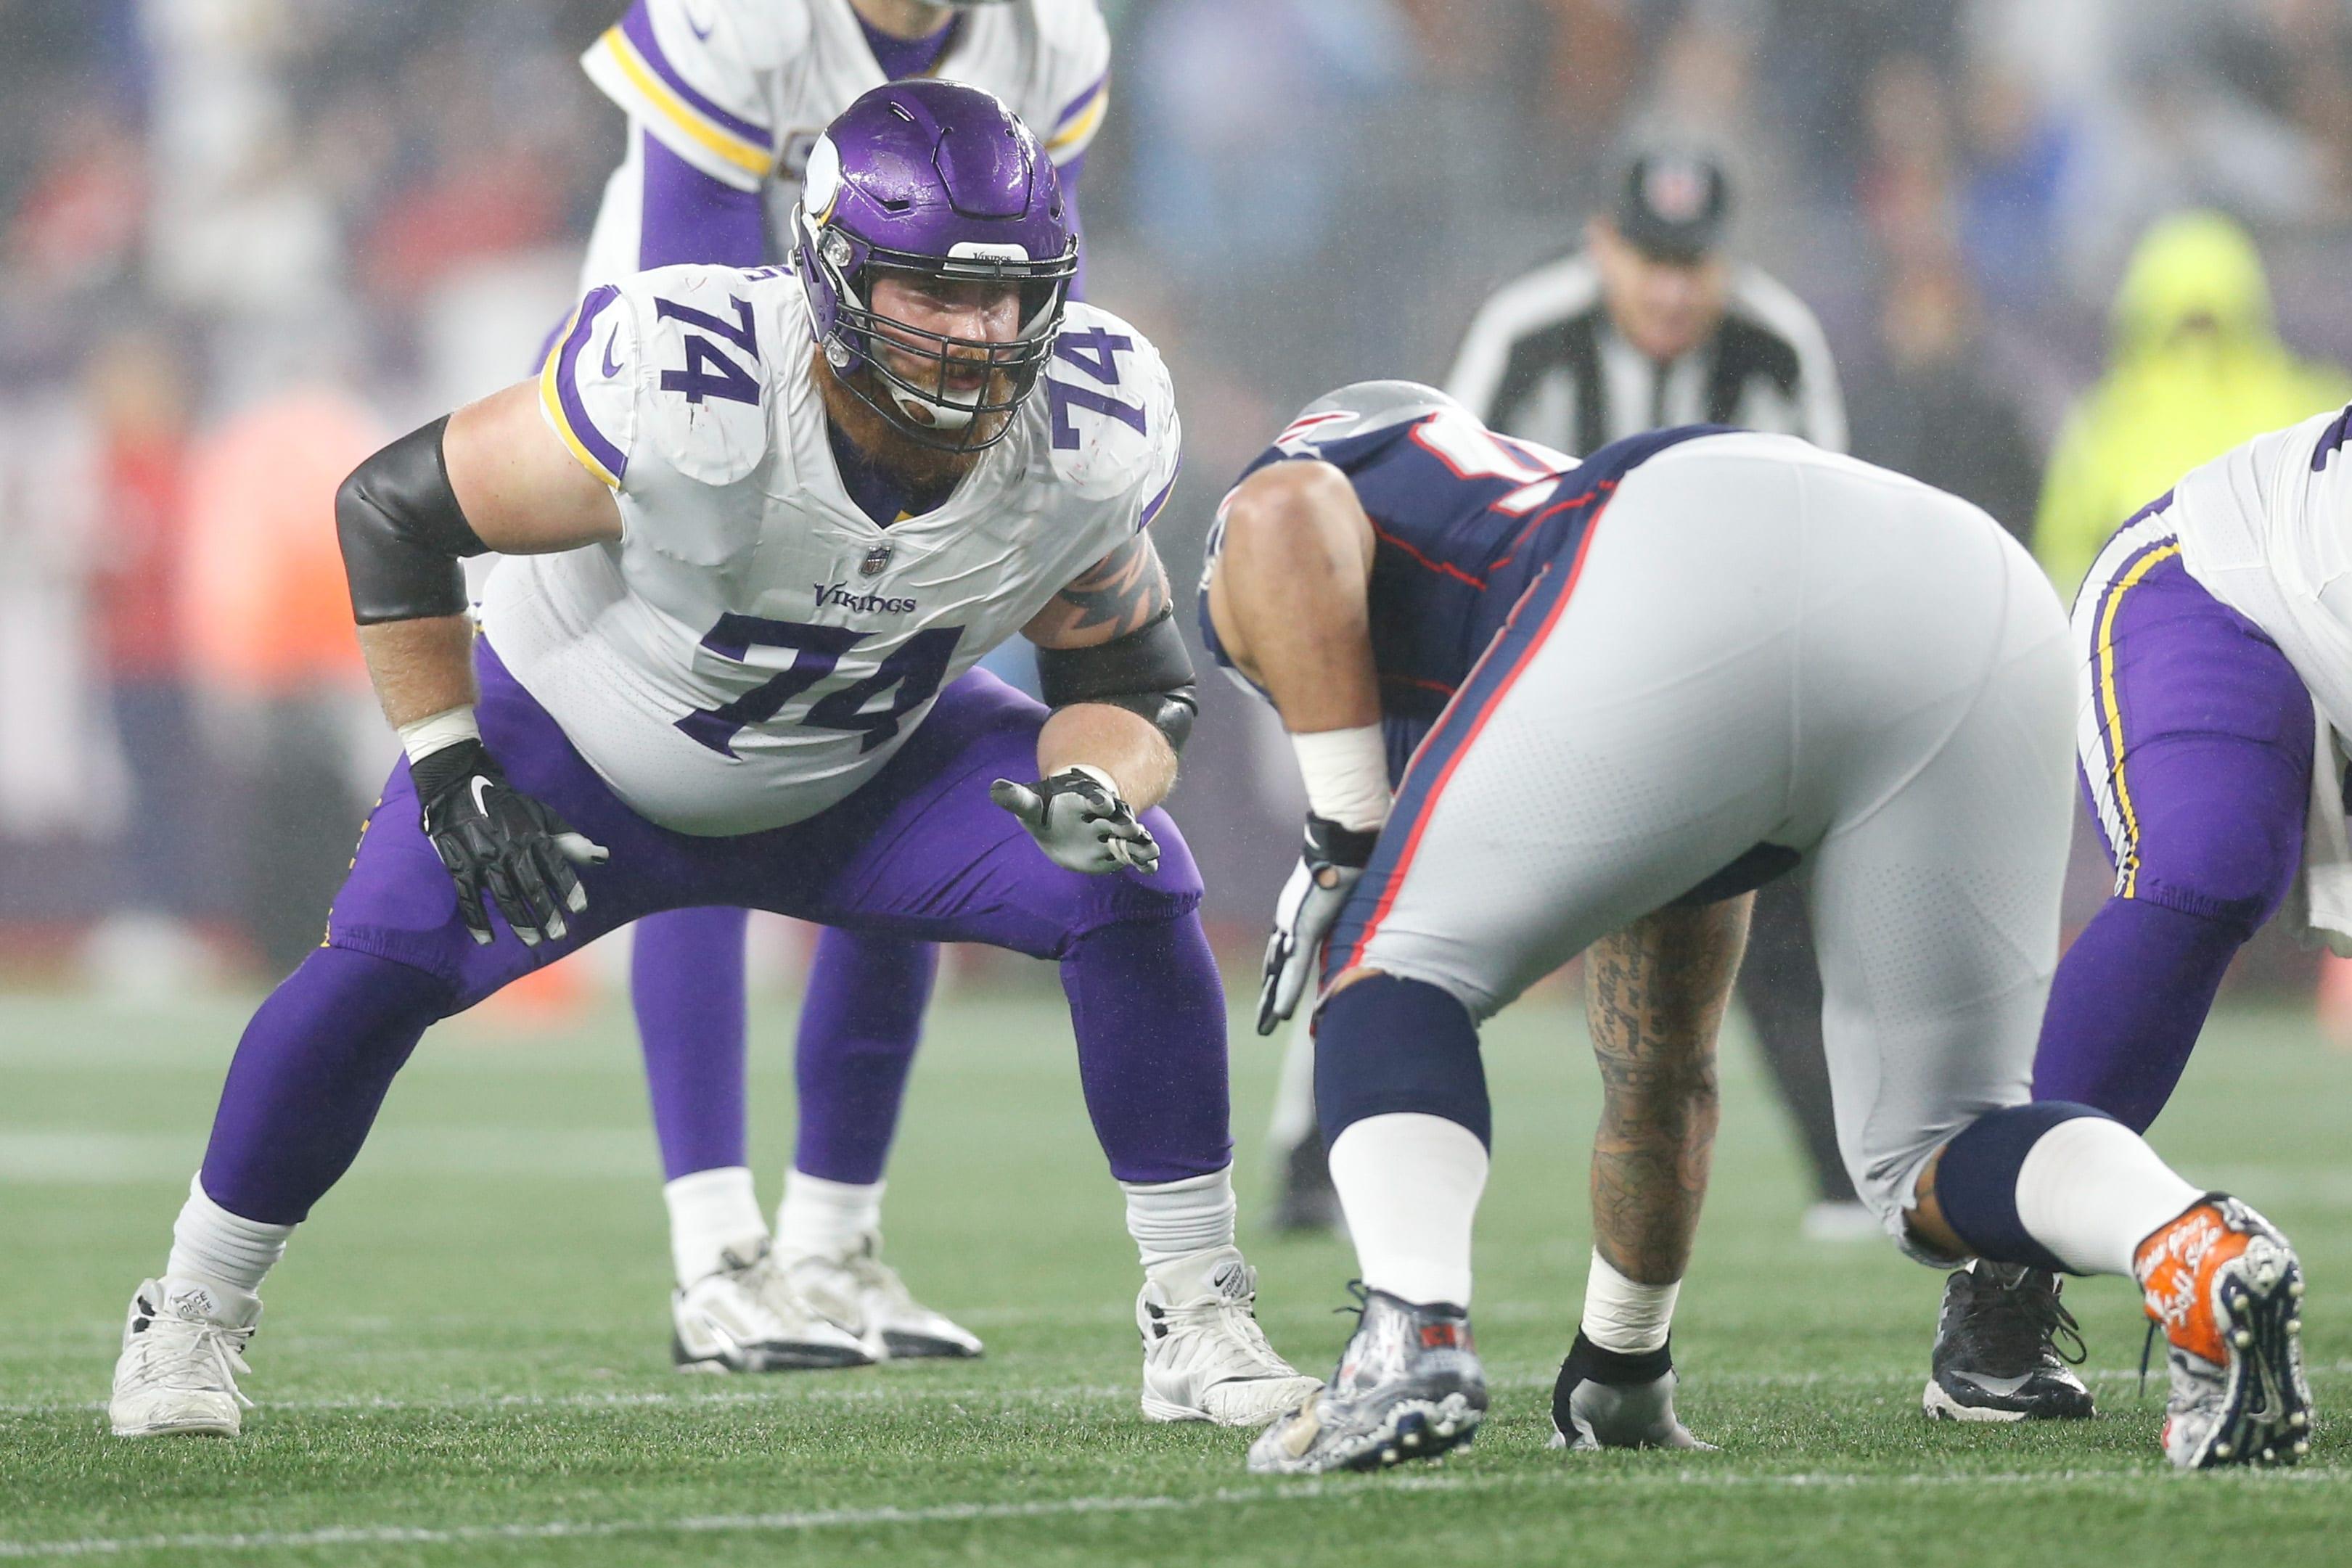 New York Giants, Mike Remmers, Minnesota Vikings